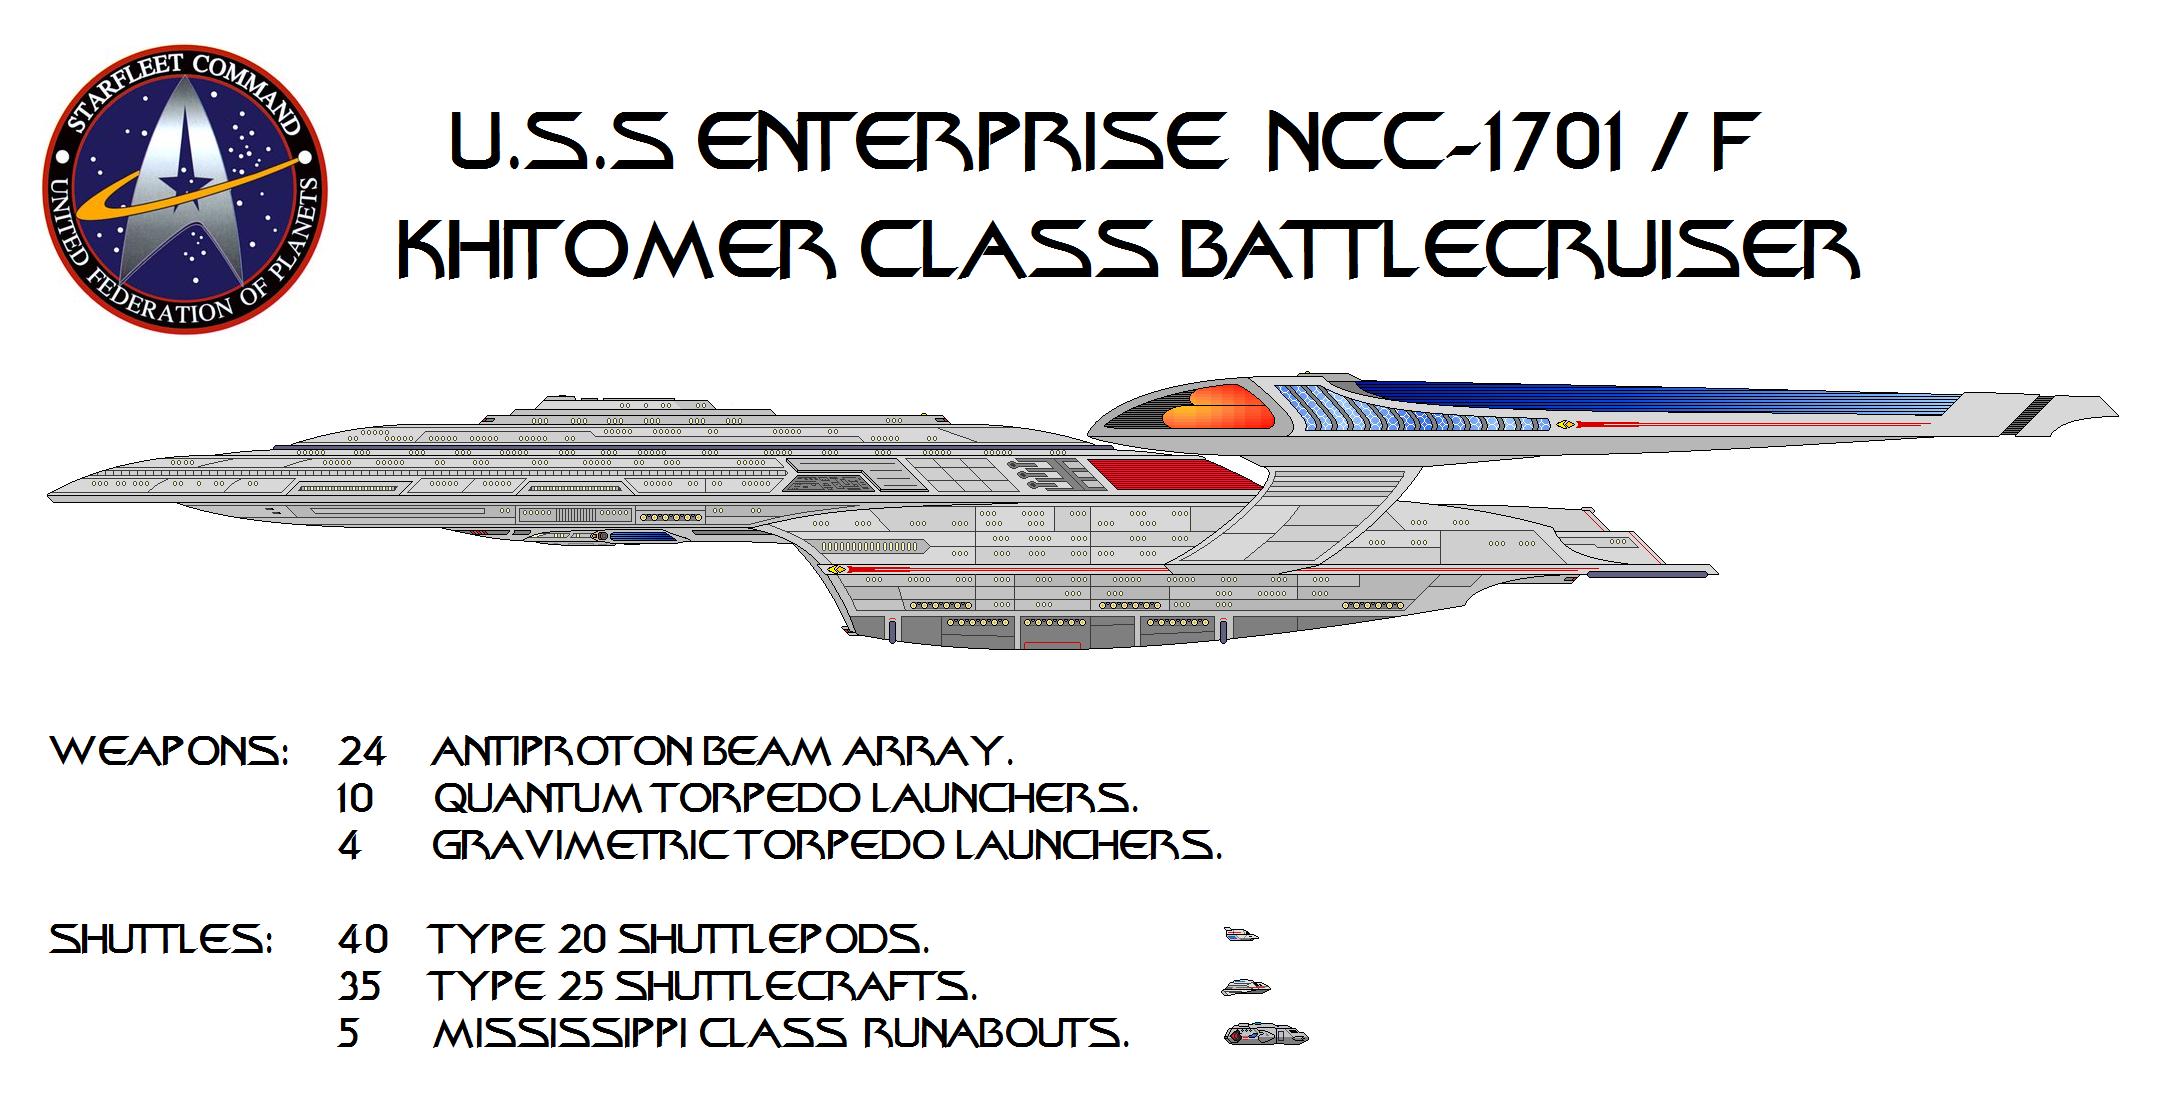 U.S.S. Enterprise NCC 1701 F Khitomer Class Battle Cruiser